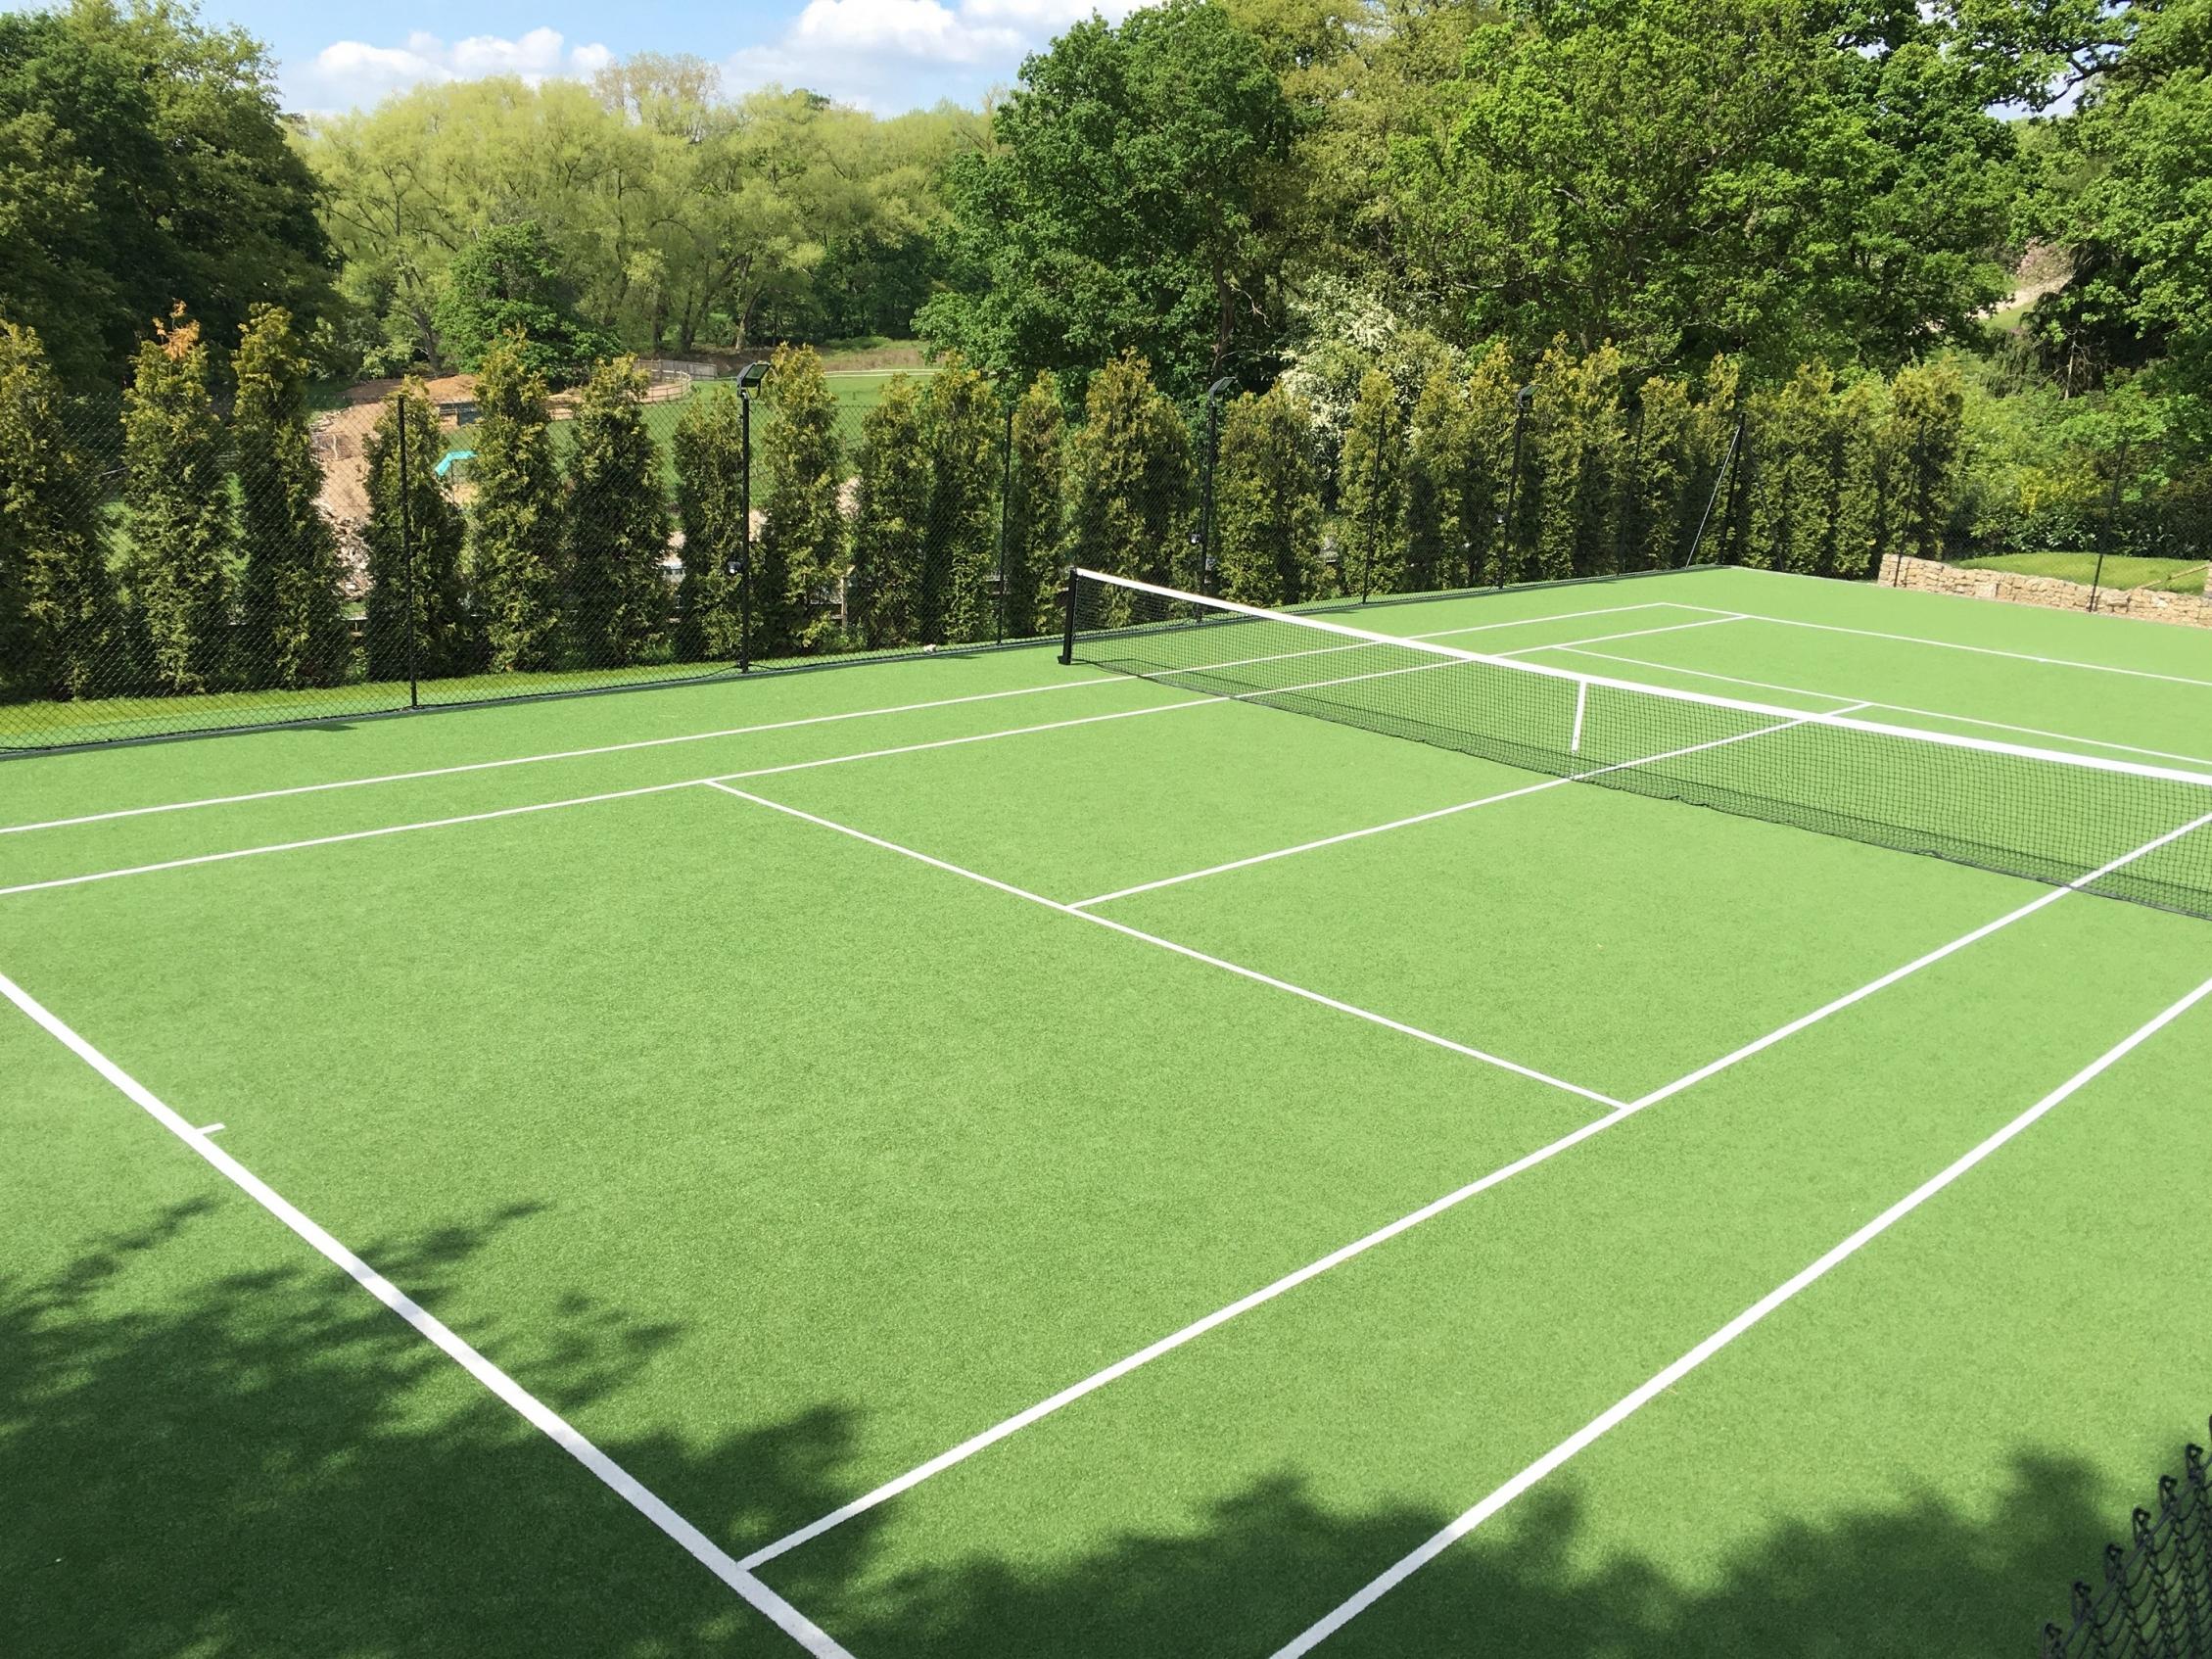 Artificial Grass & Turf For Tennis Courts - TigerTurfUK | TigerTurf UK